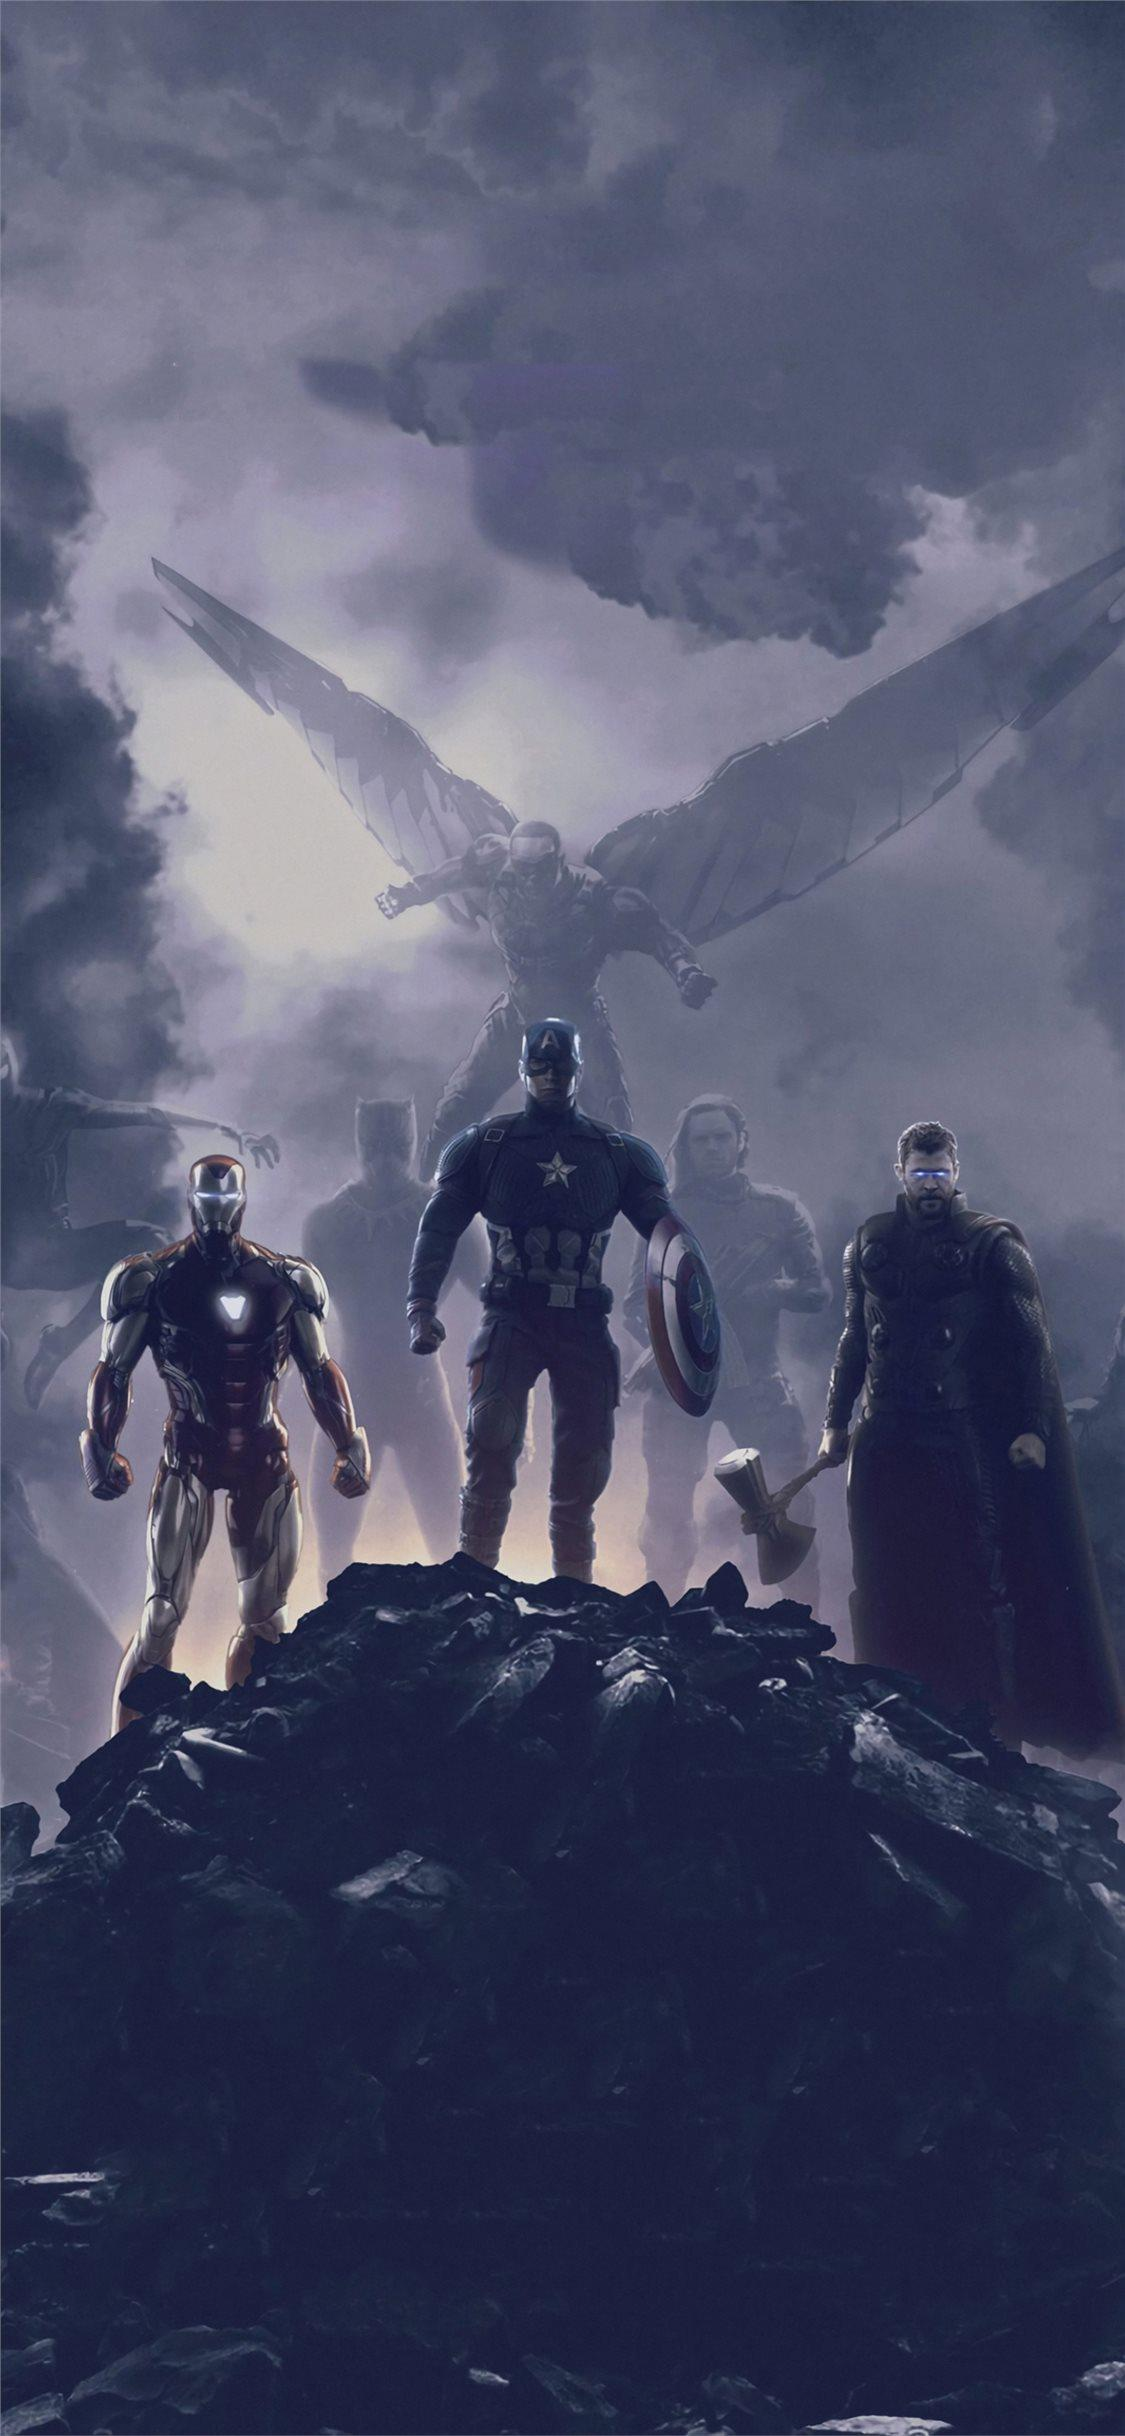 Avengers Endgame Final Battle Wallpapers - Wallpaper Cave